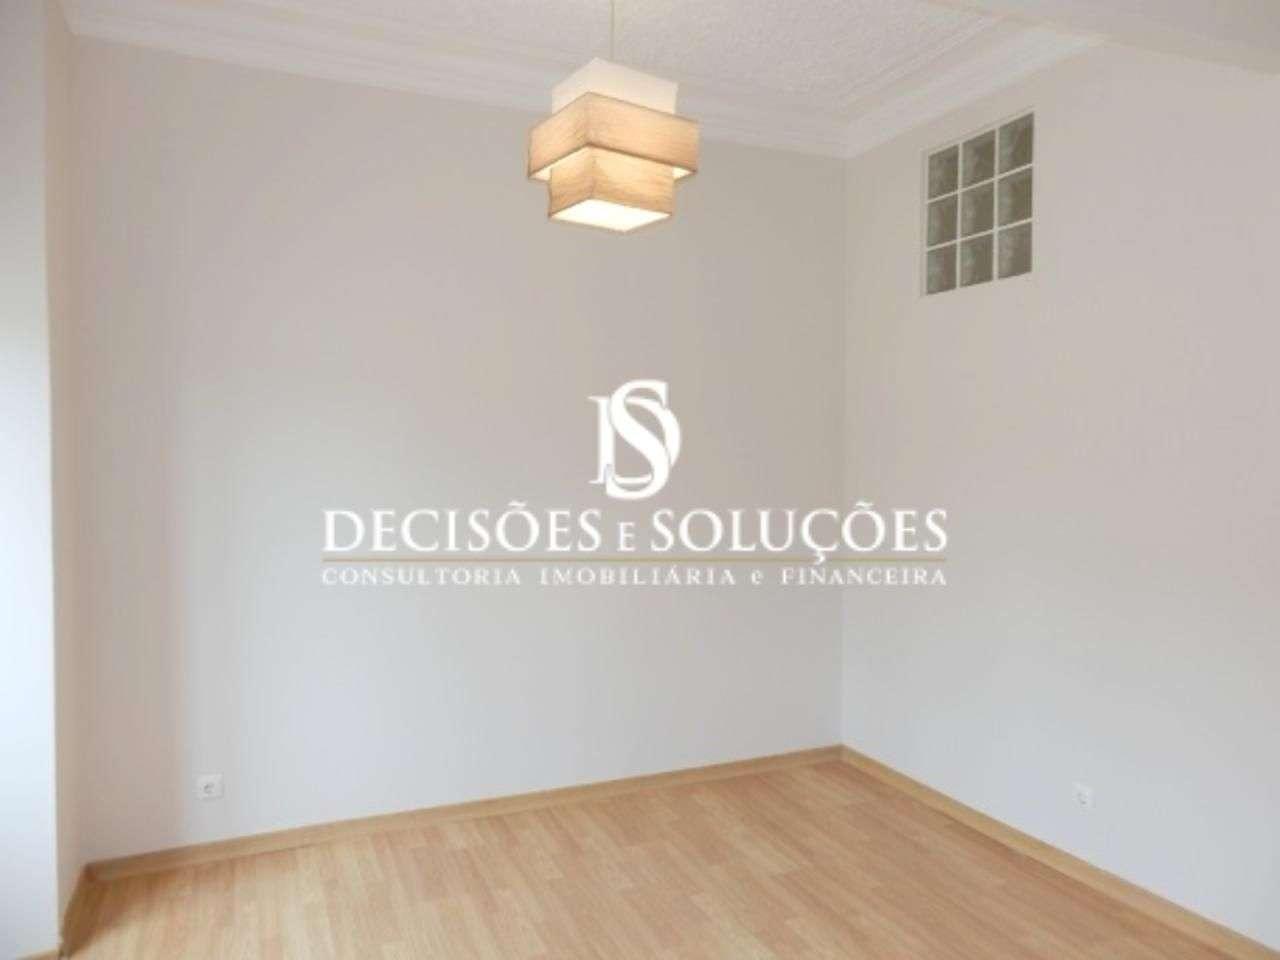 Apartamento para comprar, Marvila, Lisboa - Foto 3